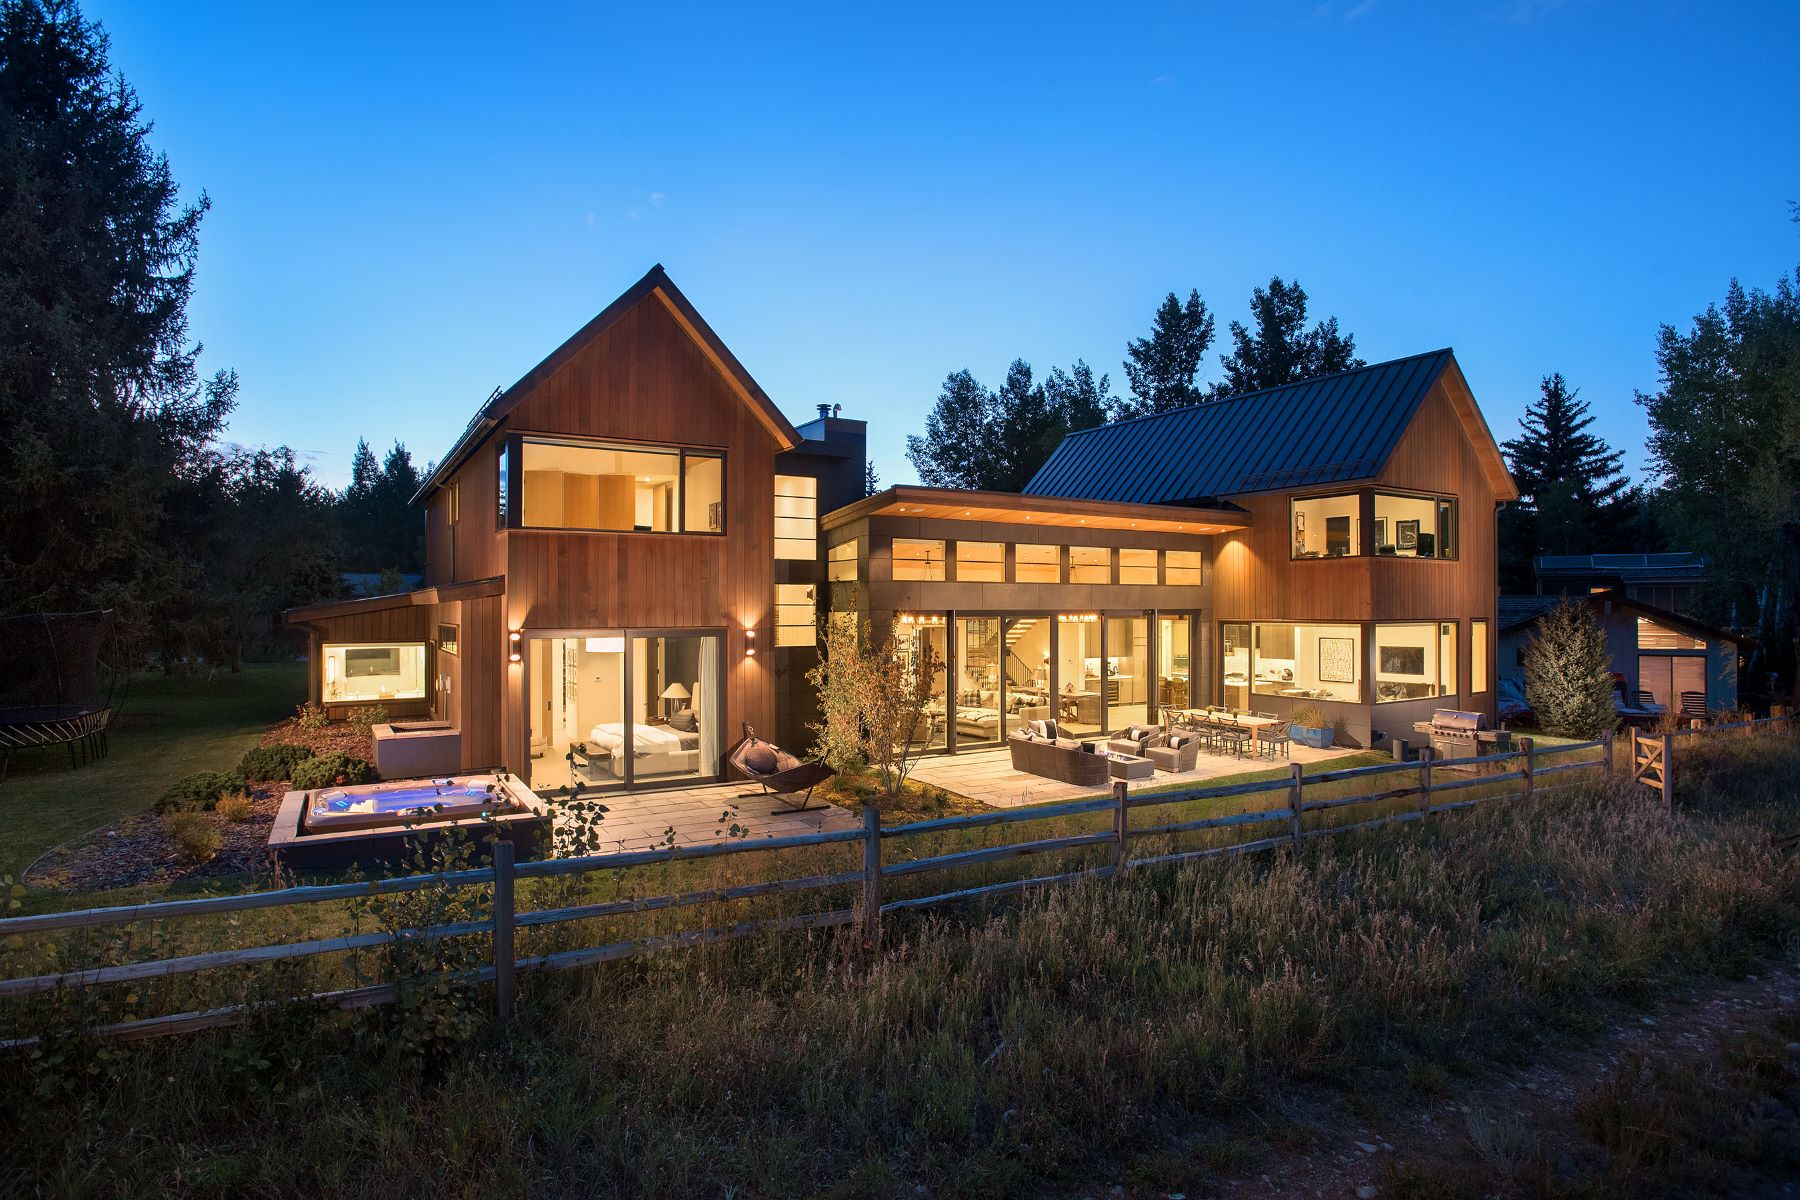 Single Family Homes for Sale at Modern Elegance on Snowbunny 1260 Snowbunny Lane Aspen, Colorado 81611 United States